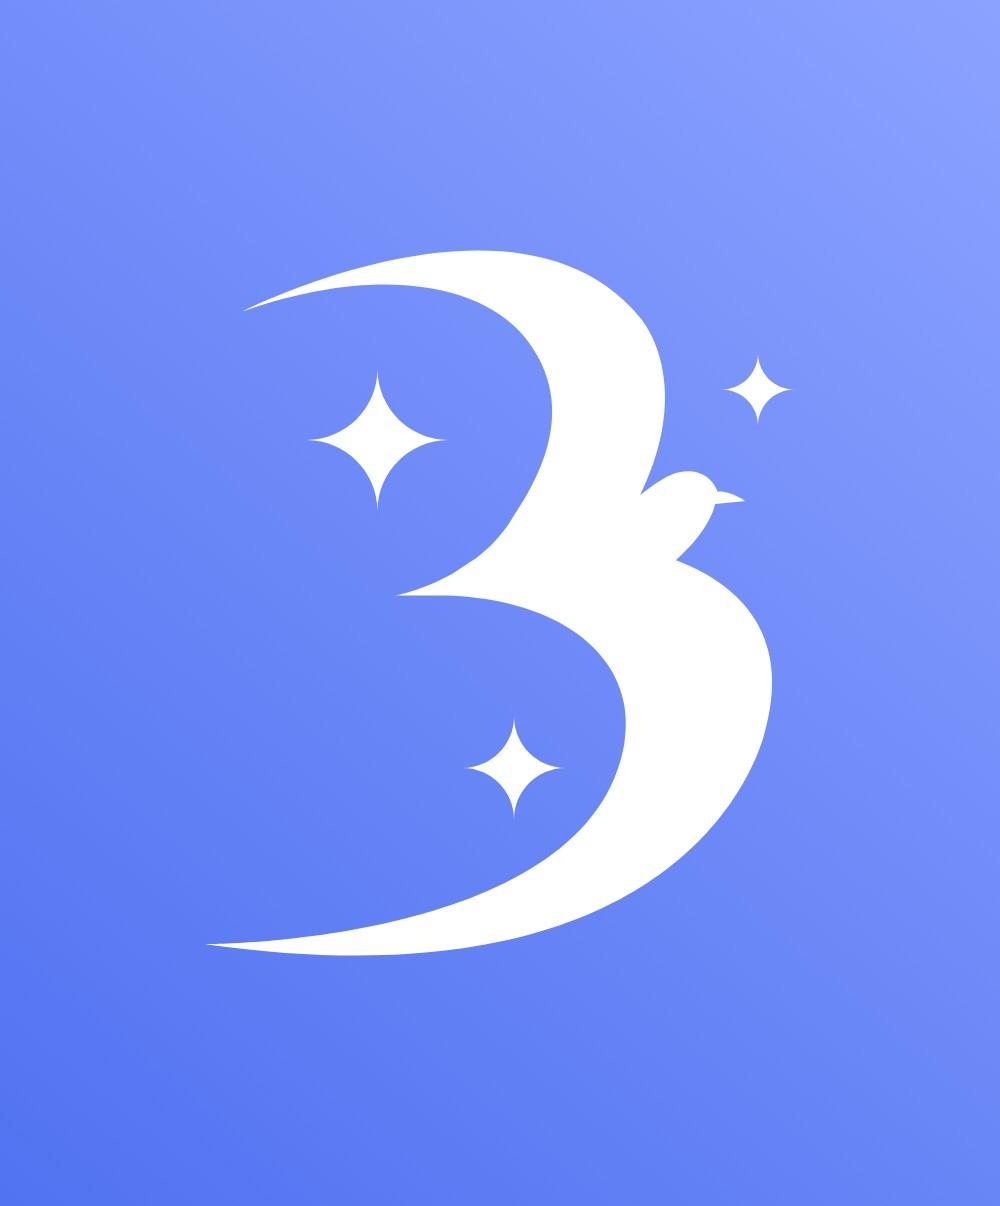 Project of Интернет-журнал «Вечерний Владивосток»